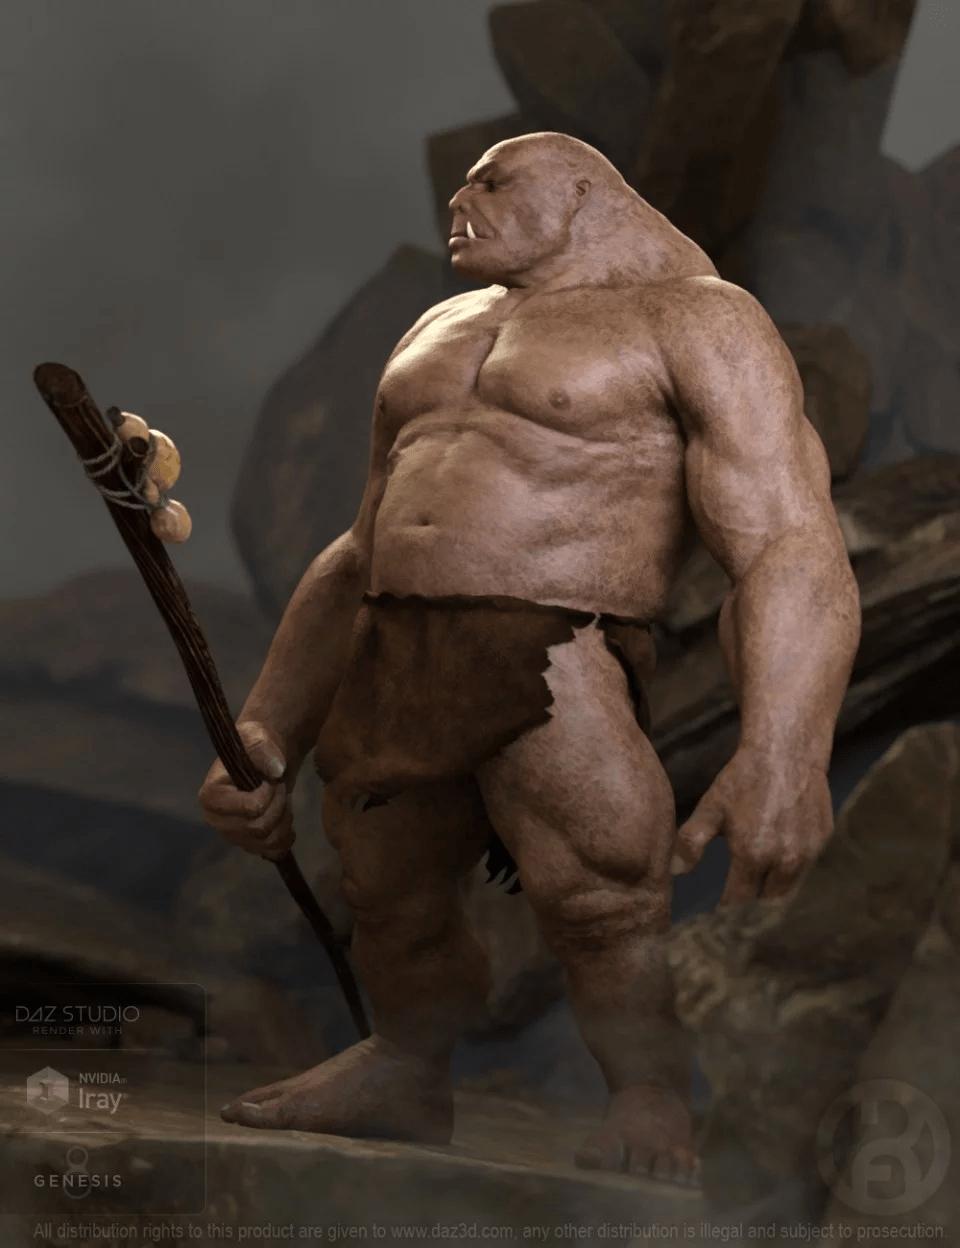 the-big-beast-ogre-for-genesis-8-male